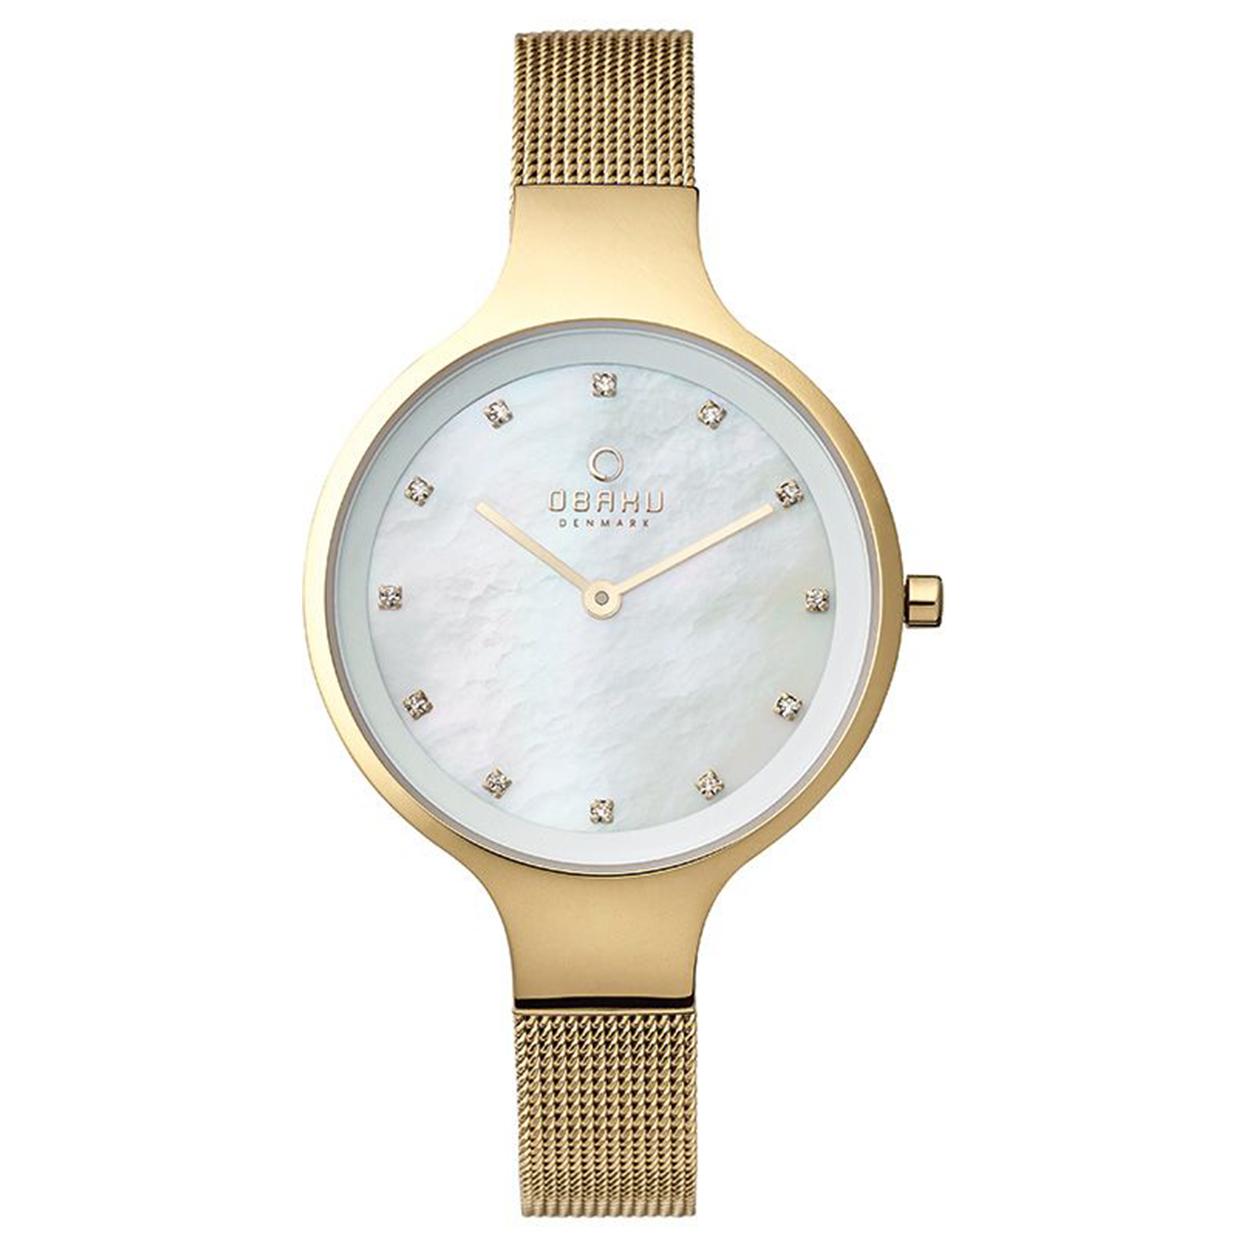 Zegarek Obaku V173LXGGMG - grawer na stalowej kopercie